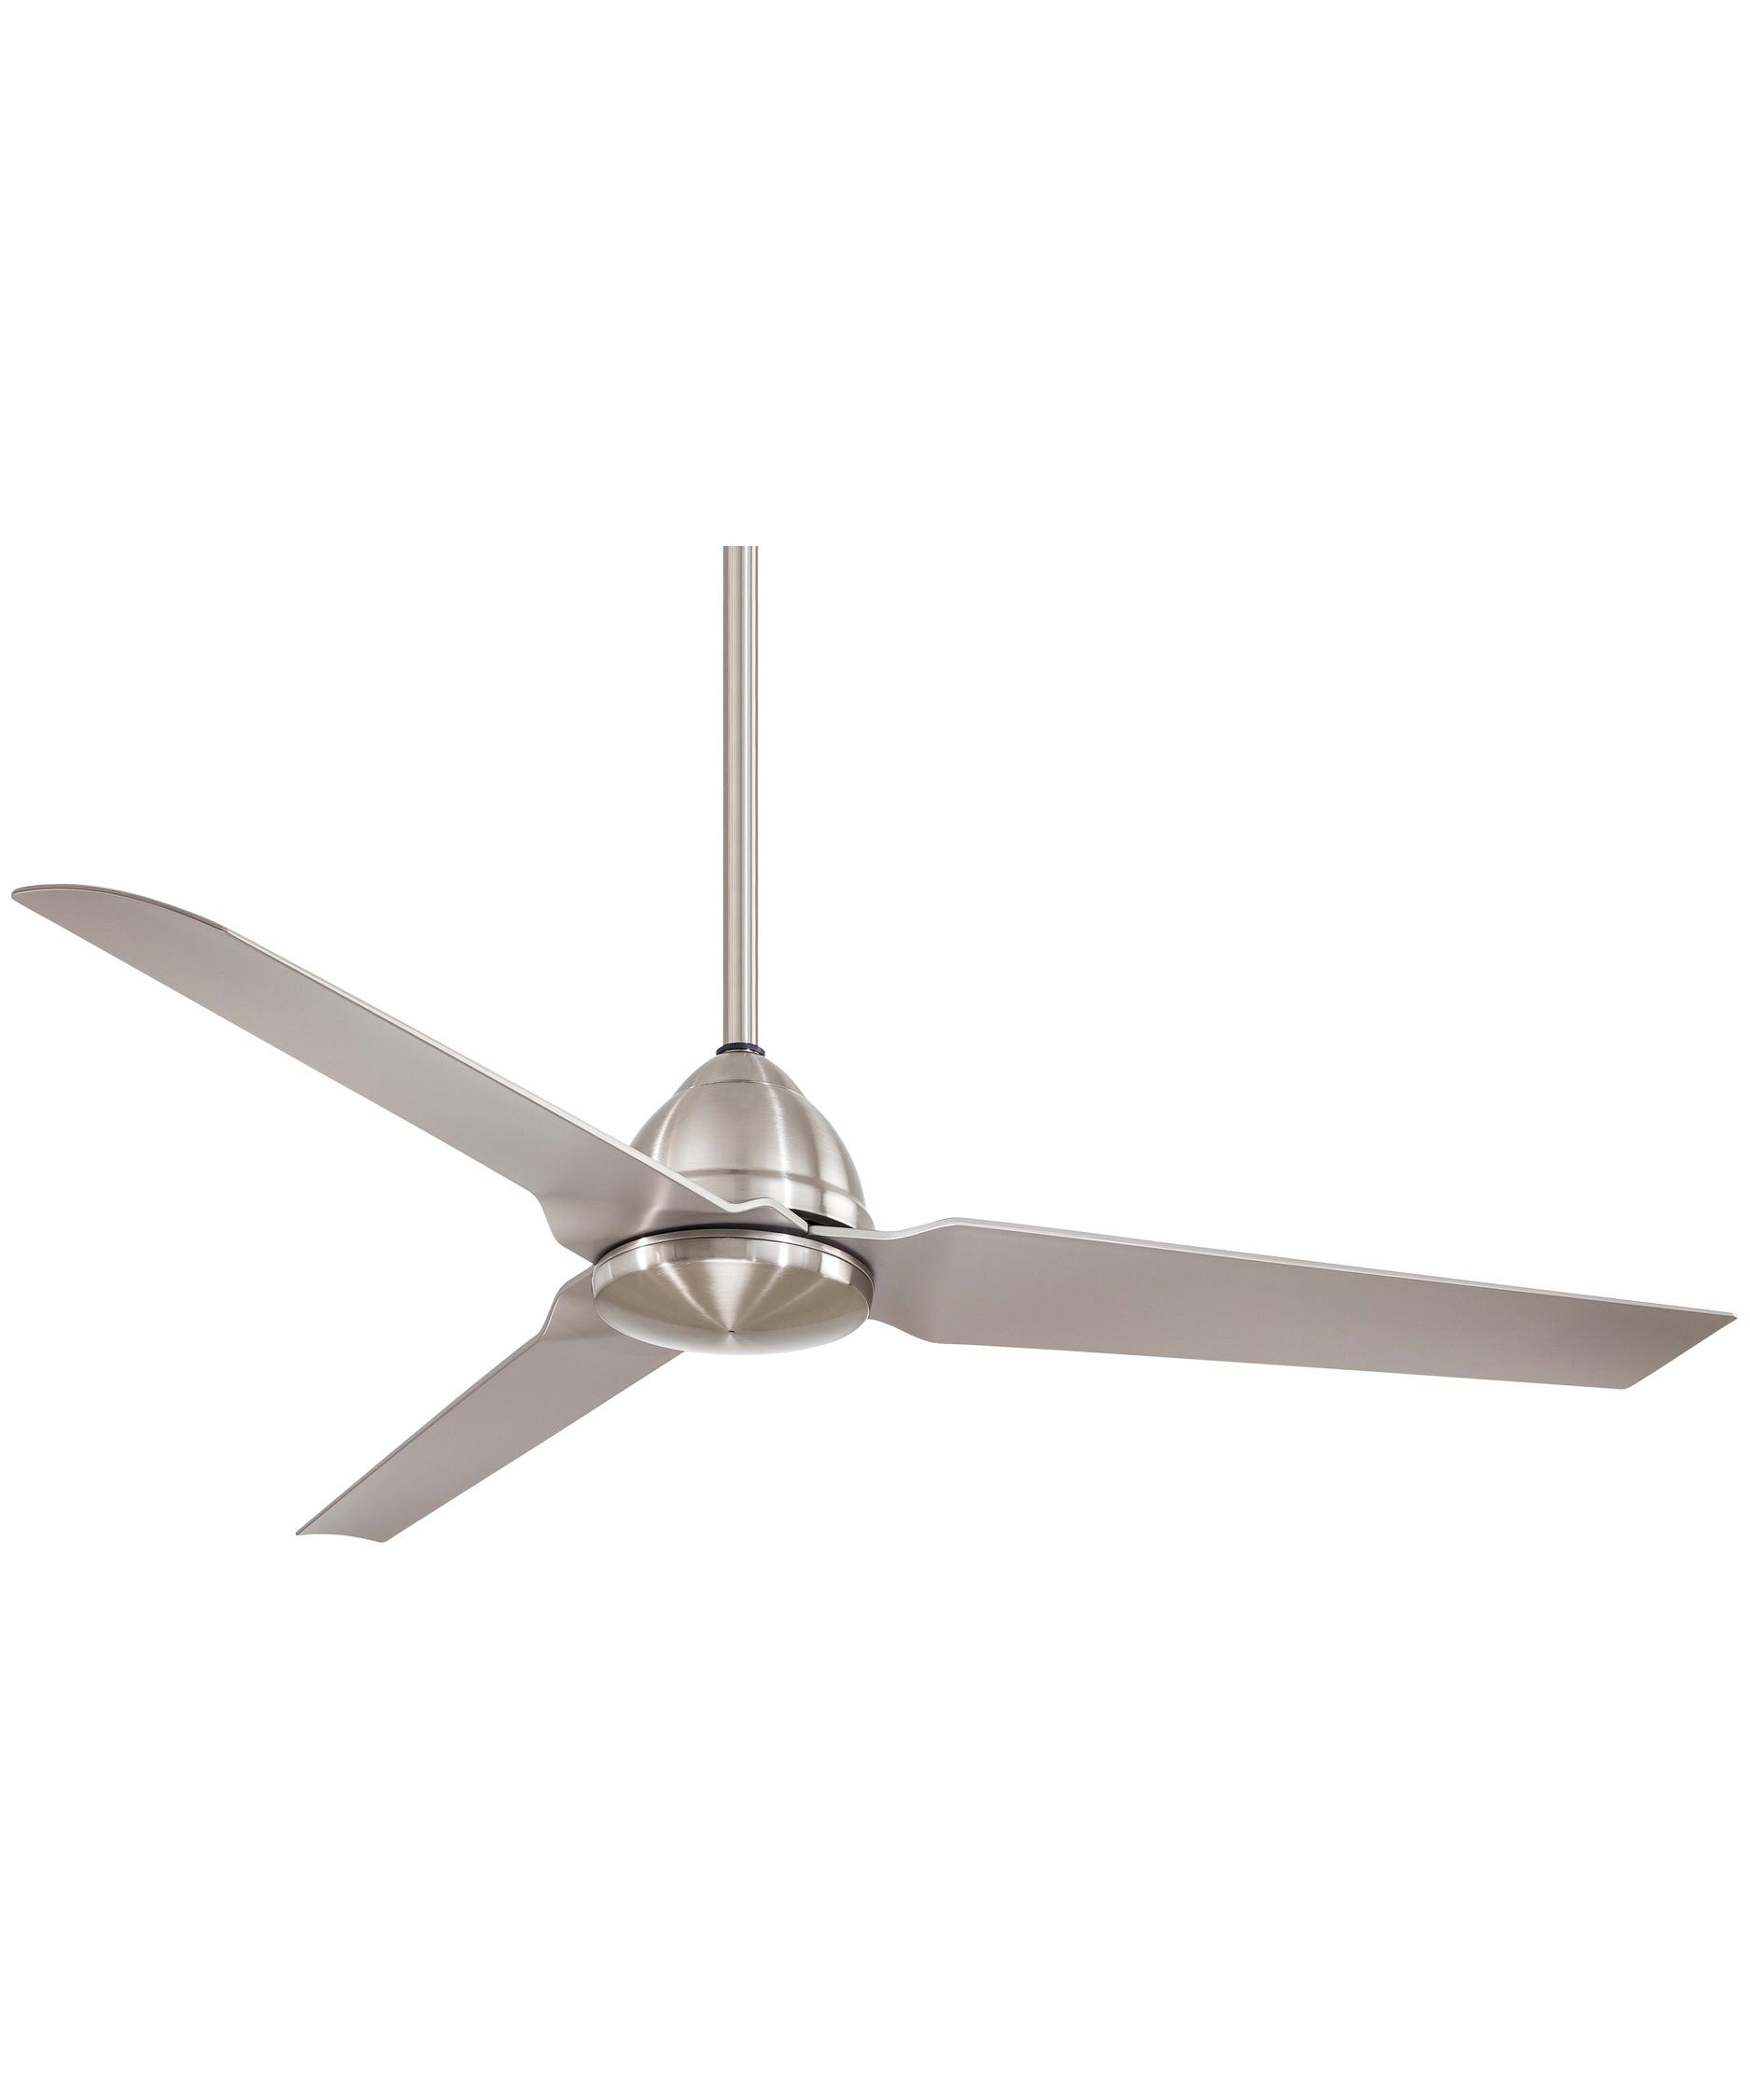 minka aire f java  inch  blade ceiling fan  capitol  - minka aire f java  inch  blade ceiling fan  capitol lightinglightingcom